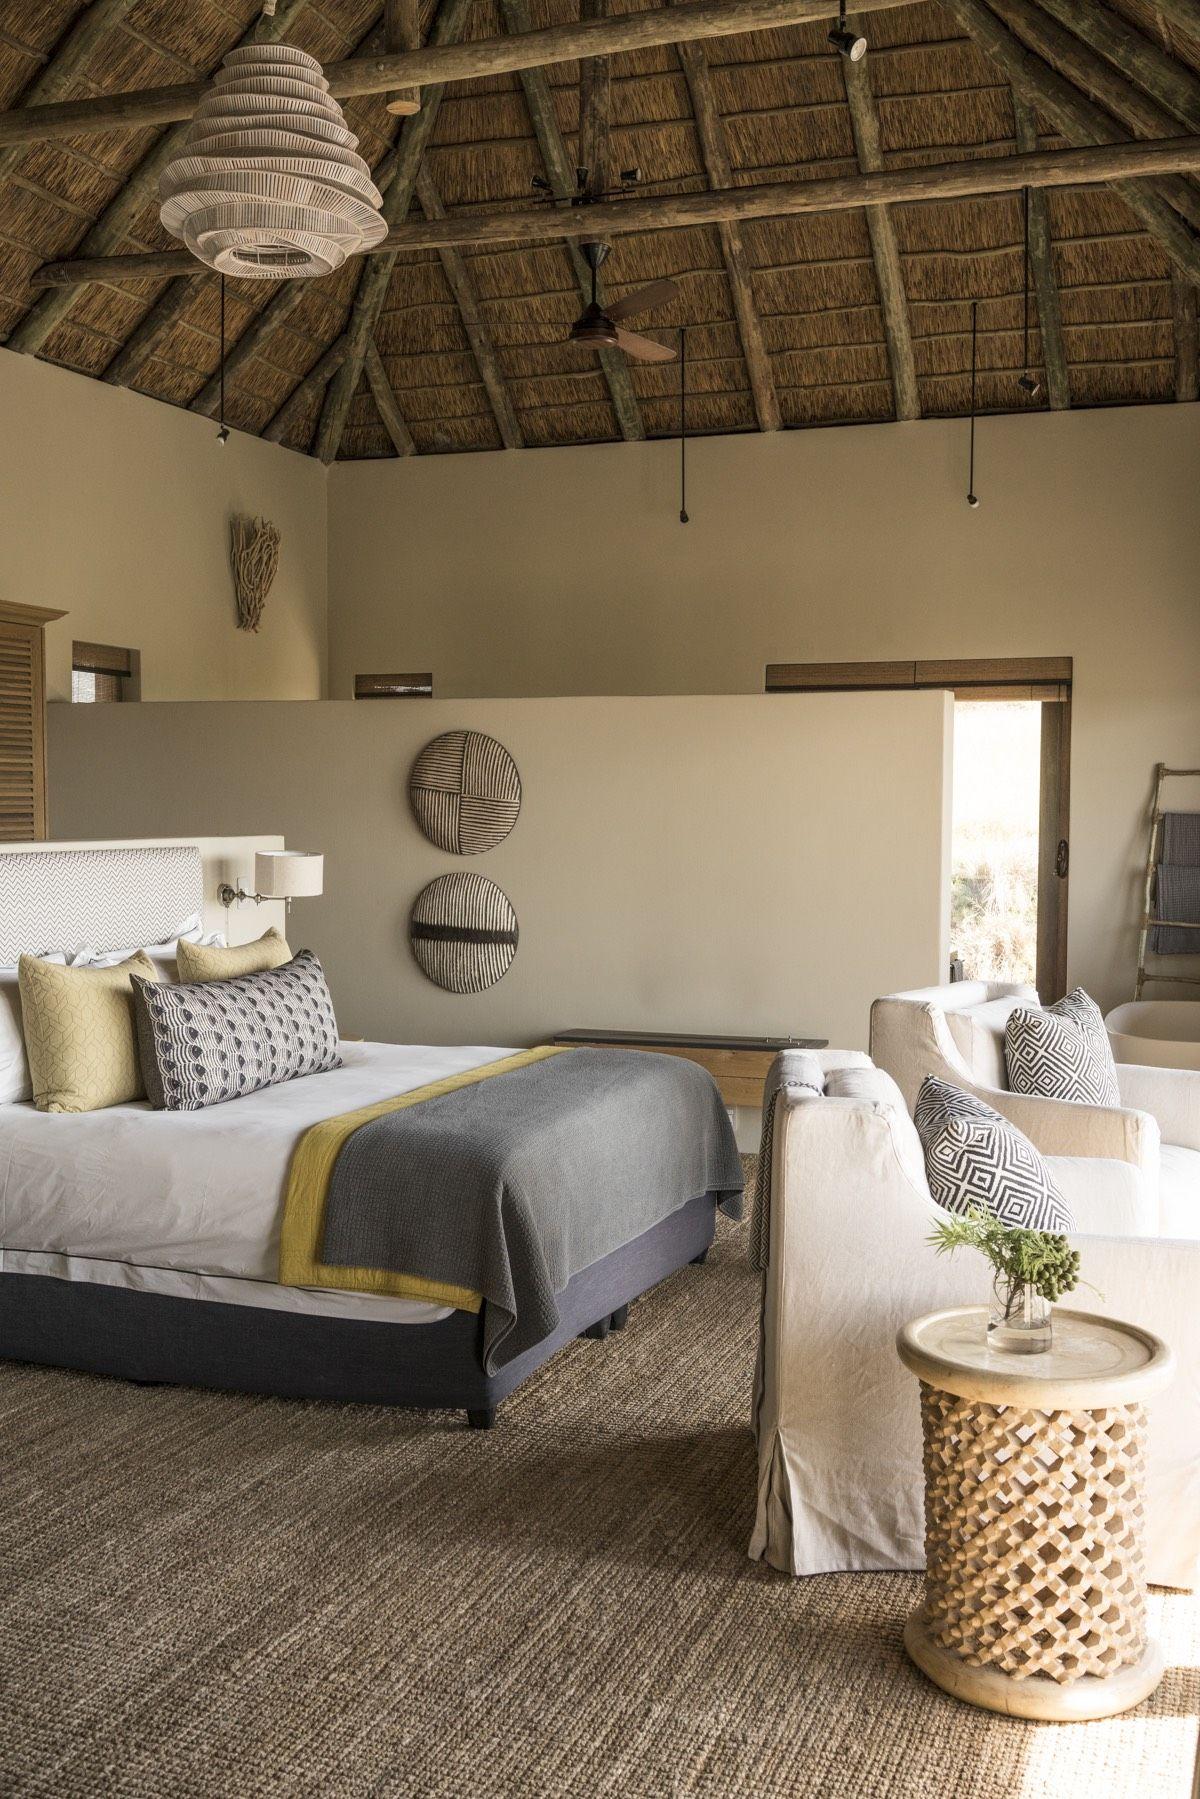 Where To Go On Safari Near Cape Town Gondwana Game